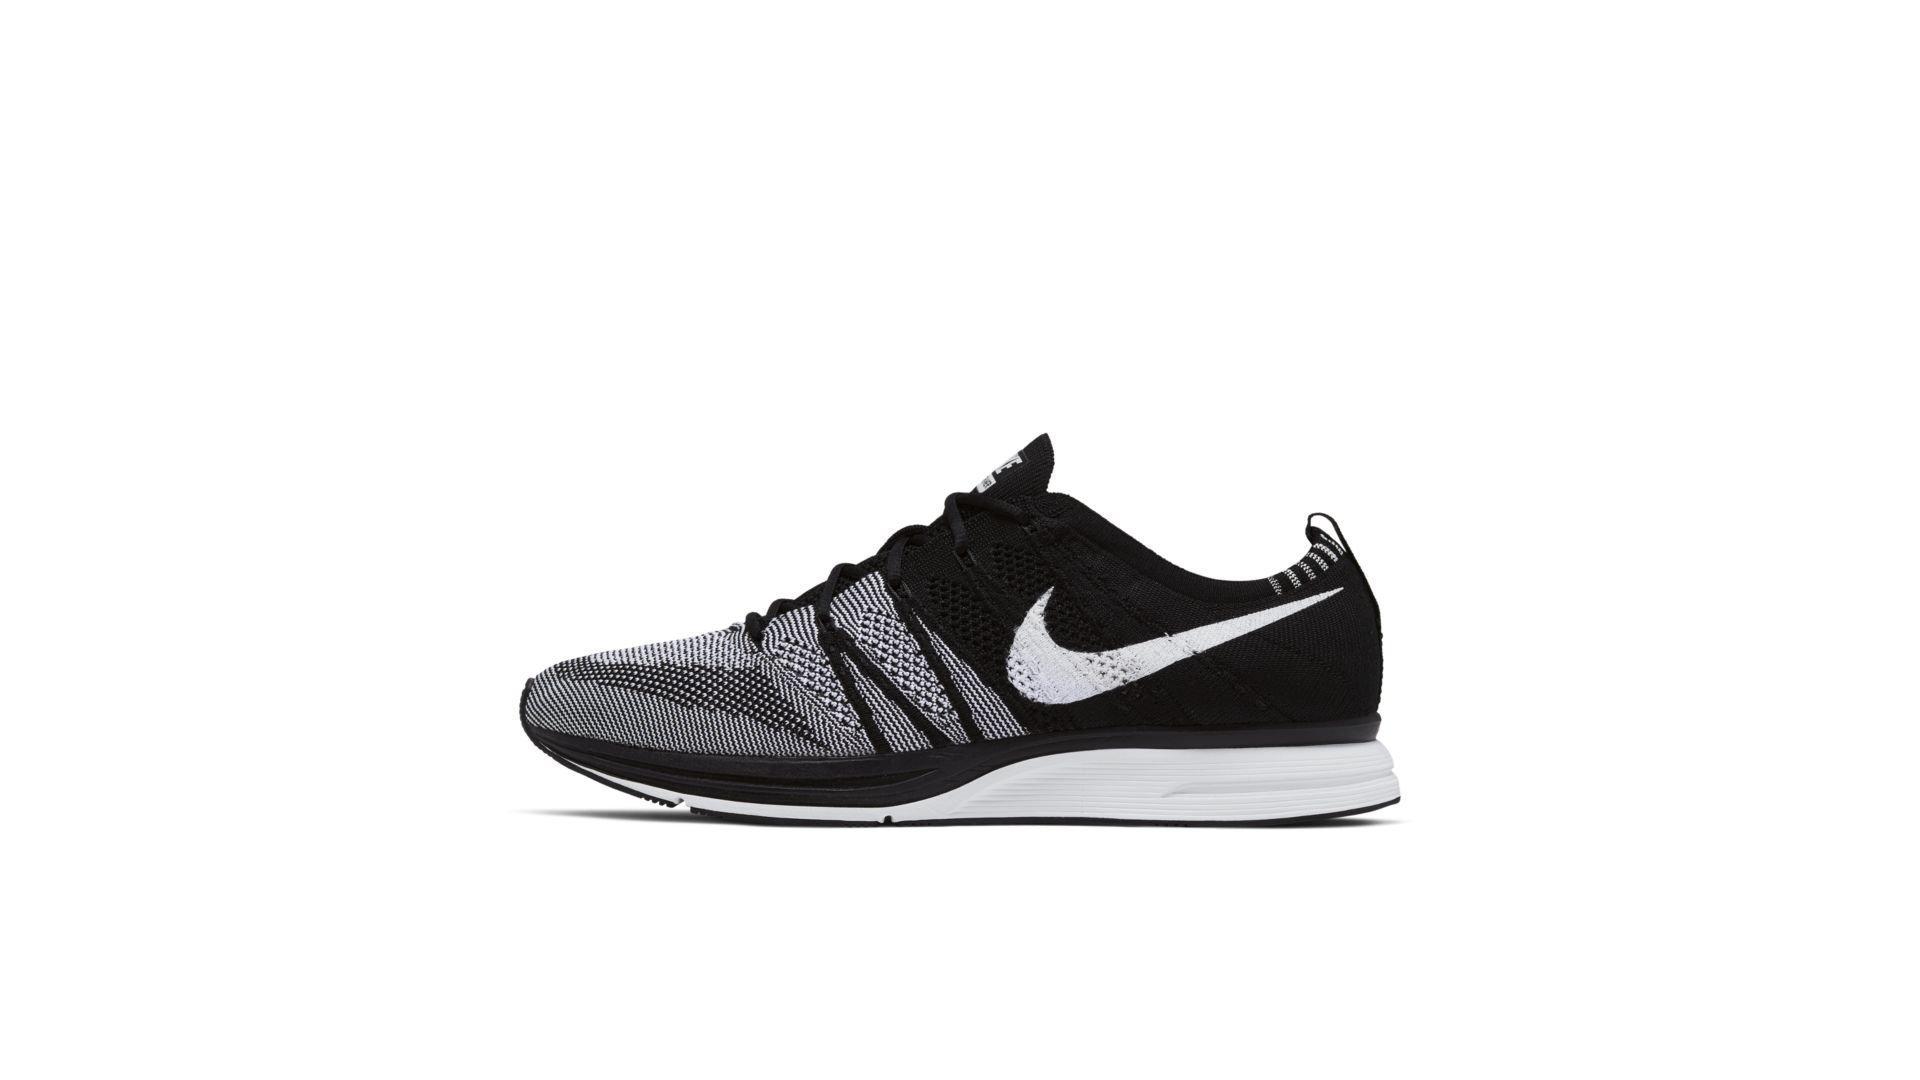 Nike Flyknit Trainer Oreo (AH8396-005)